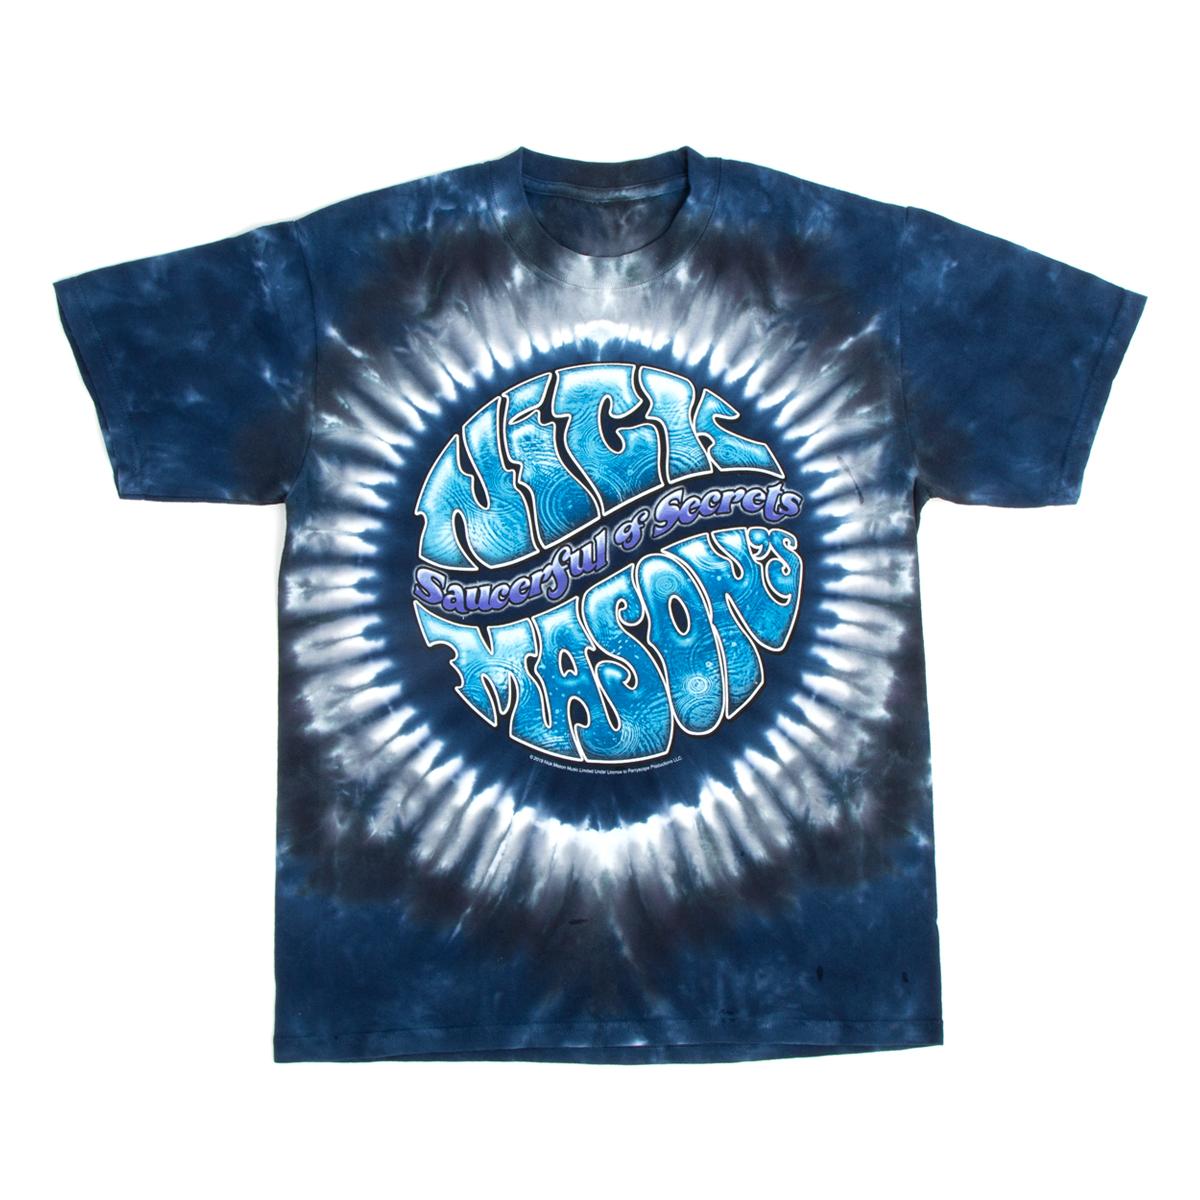 Saucerful Of Secrets 2019 Tour Tie Dye Dateback T-Shirt